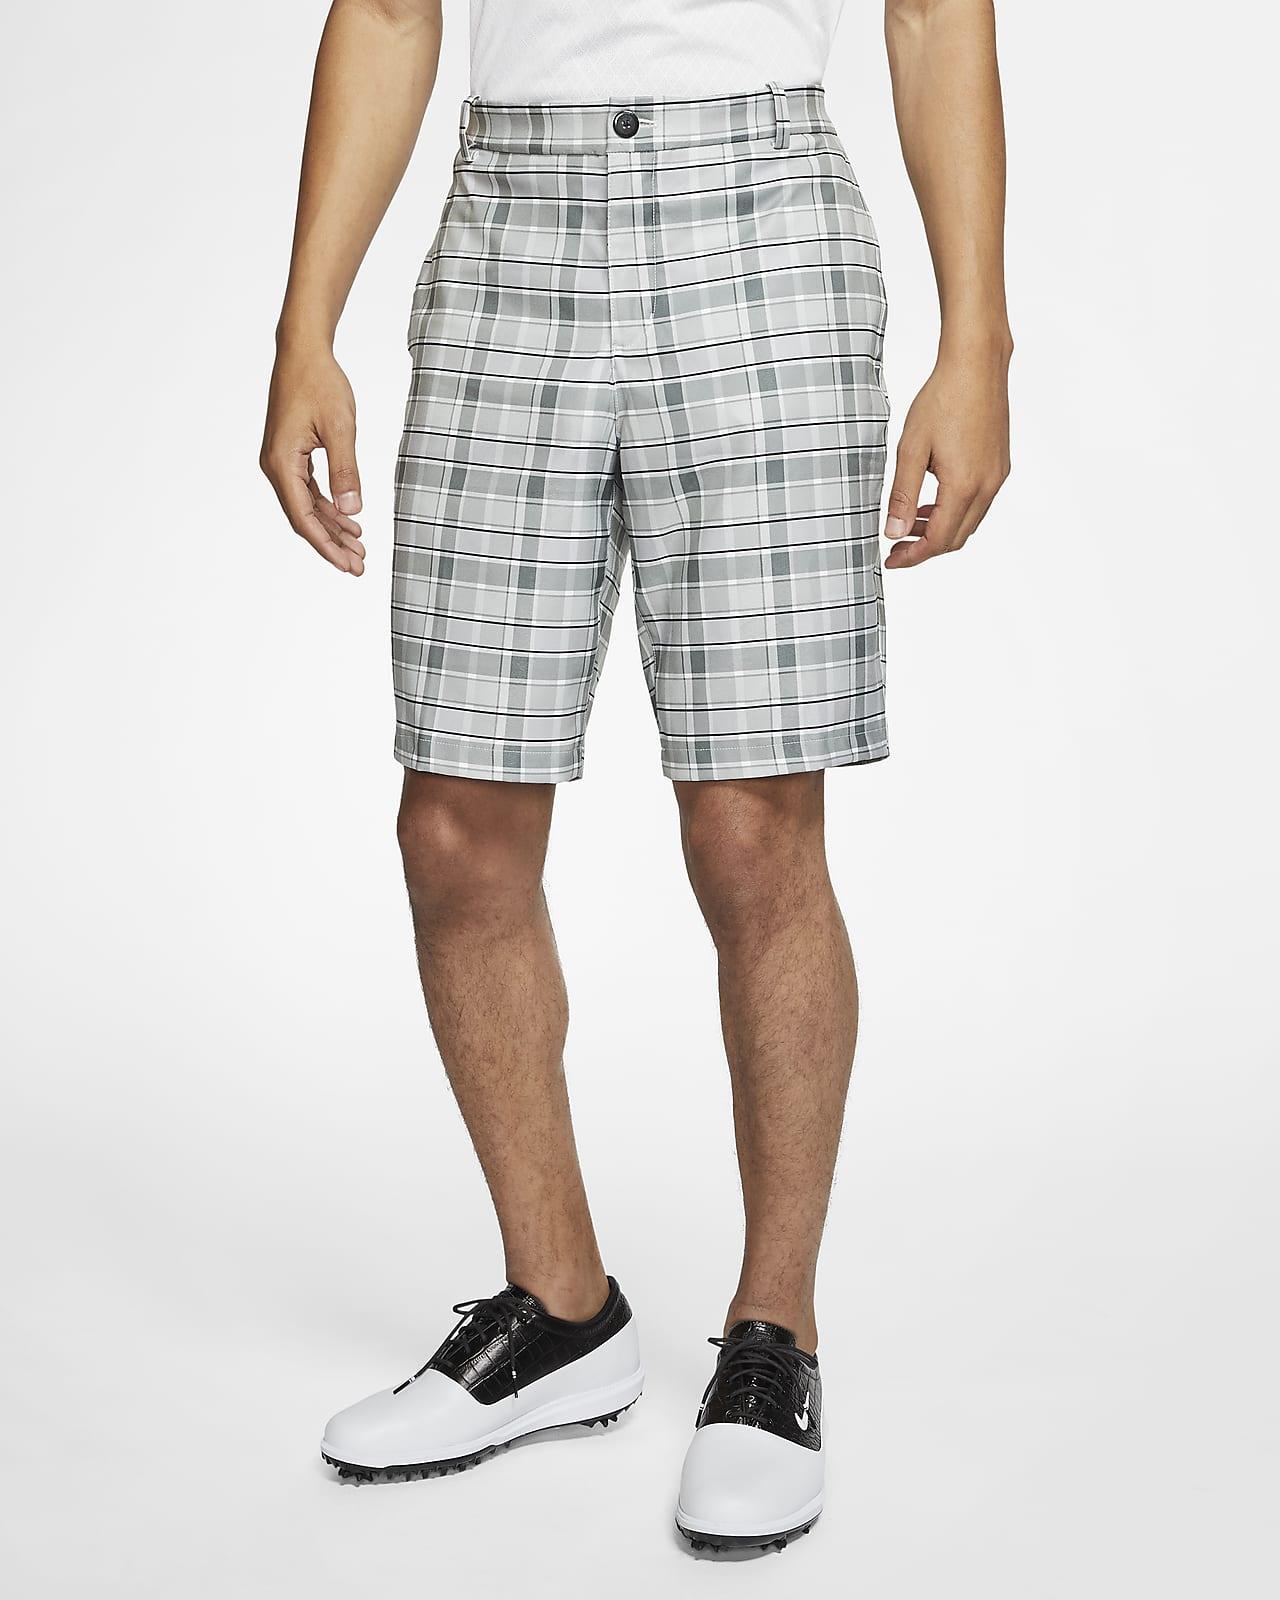 Shorts de golf a cuadros para hombre Nike Flex